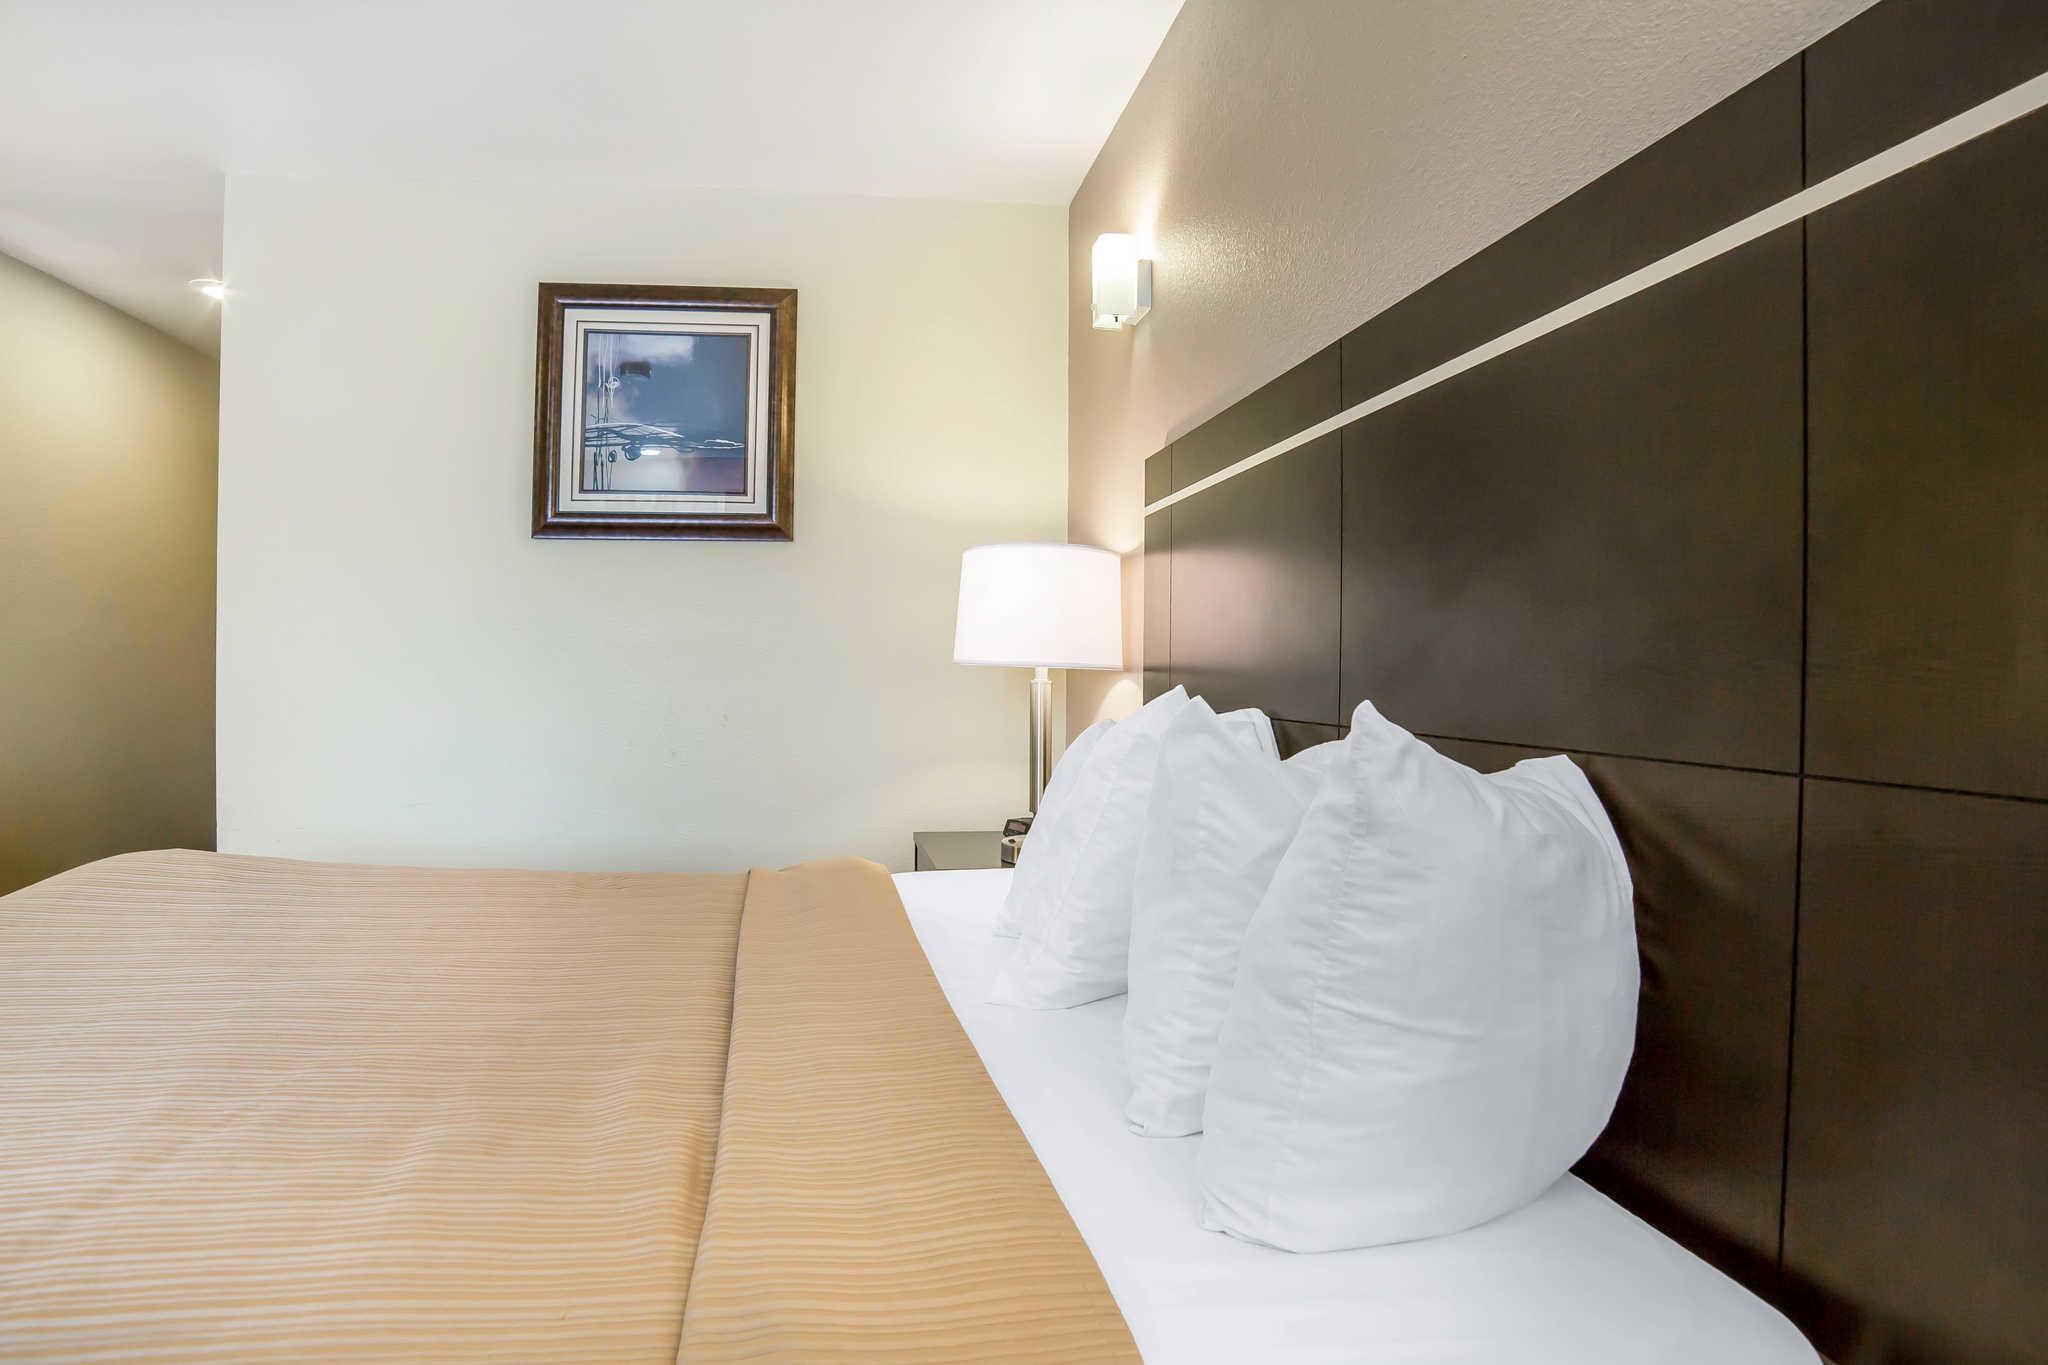 Quality Inn & Suites Elko image 5